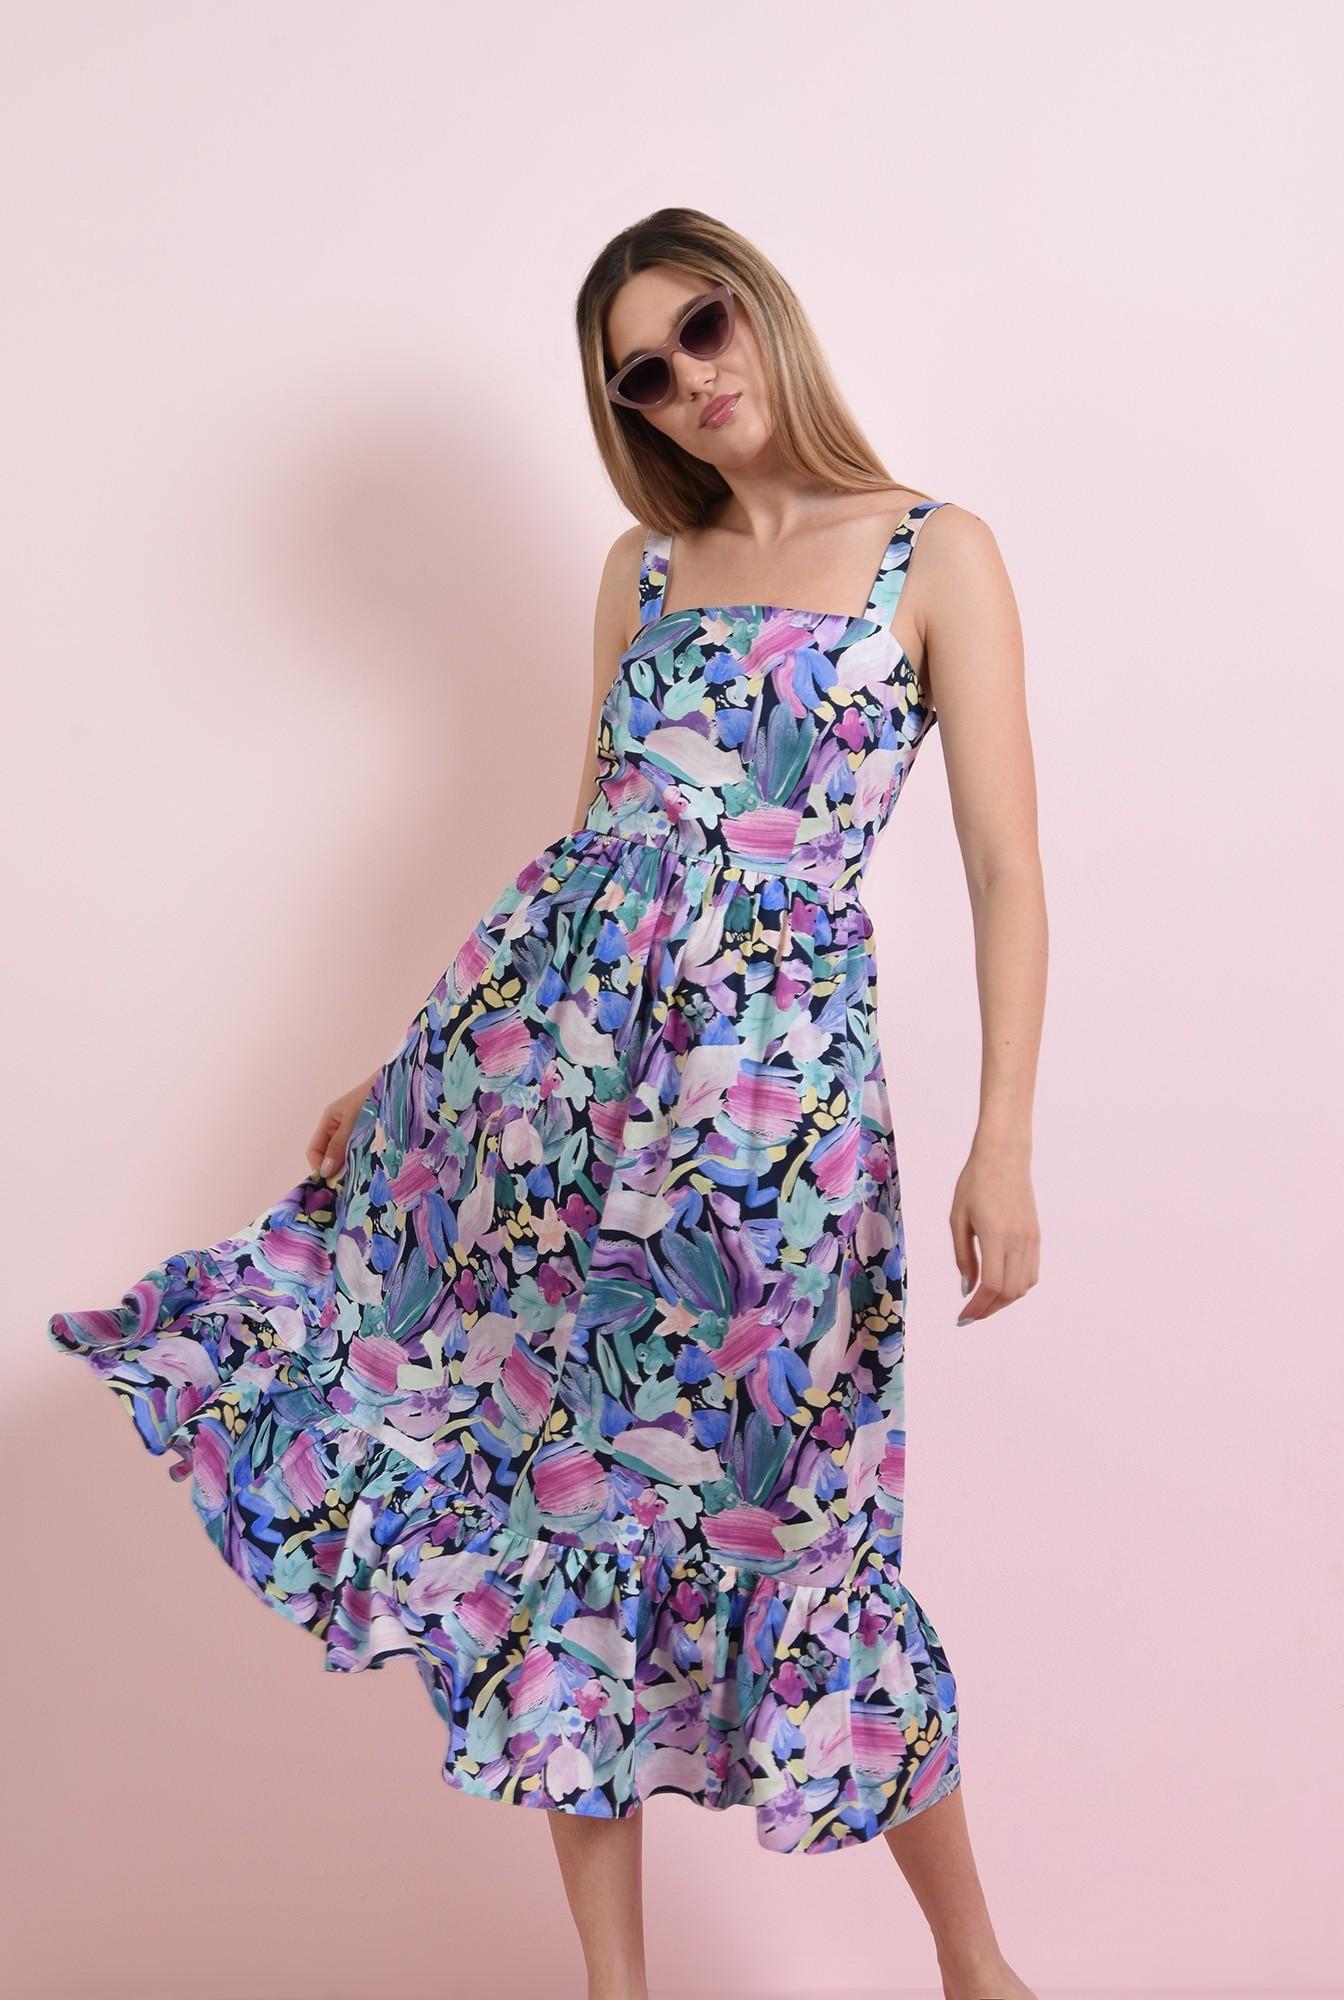 1 - rochie cu imprimeu multicolor, cu bretele